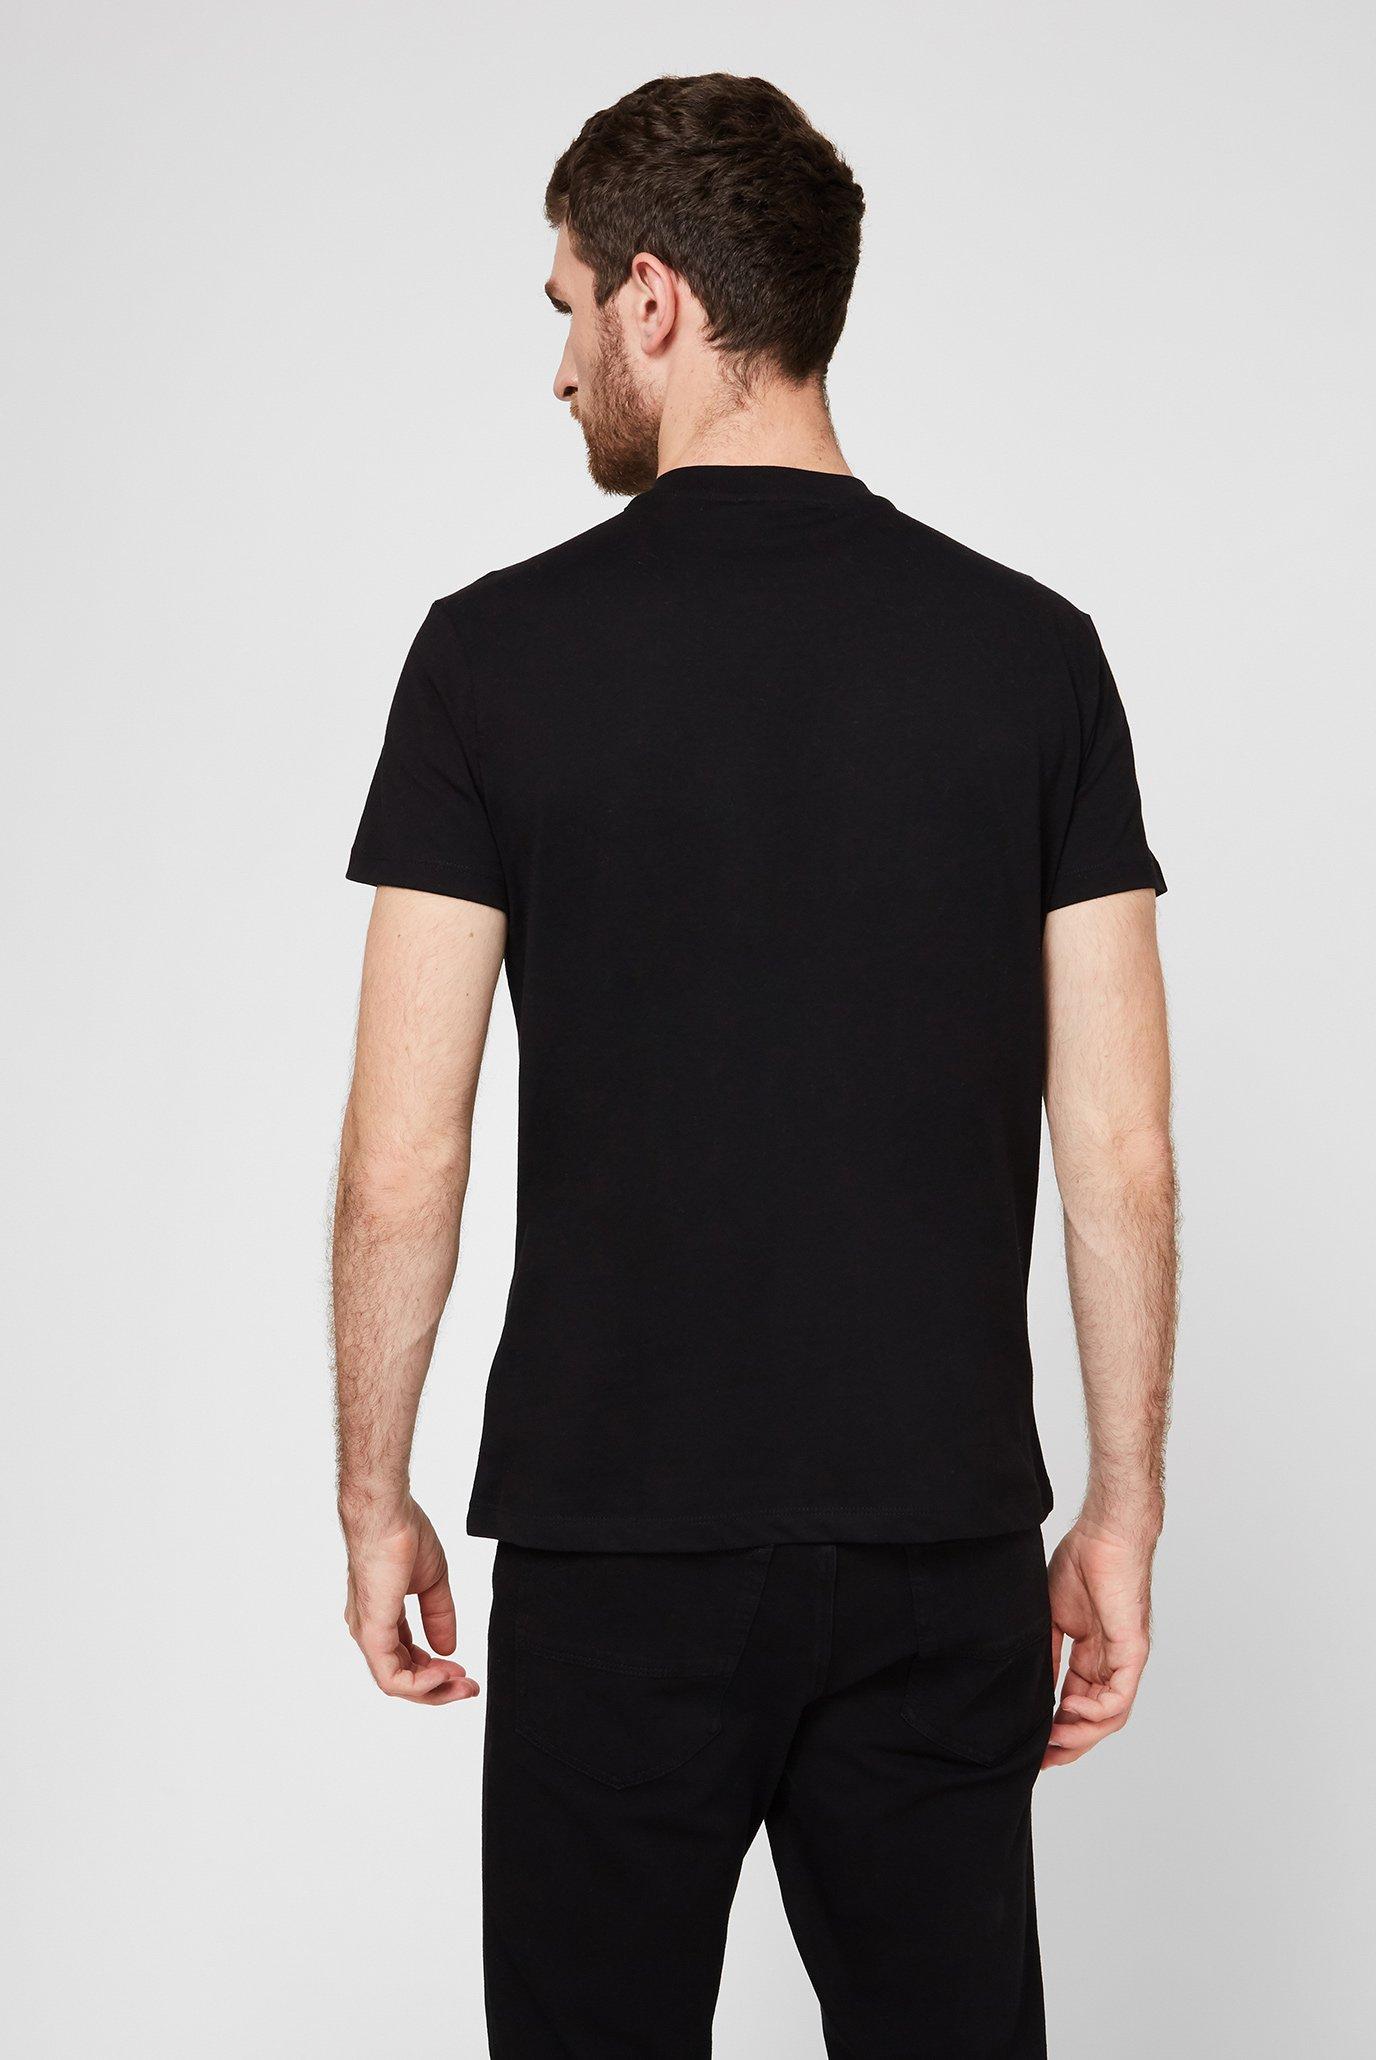 Мужская черная футболка с принтом BOXY FIT Trussardi Jeans